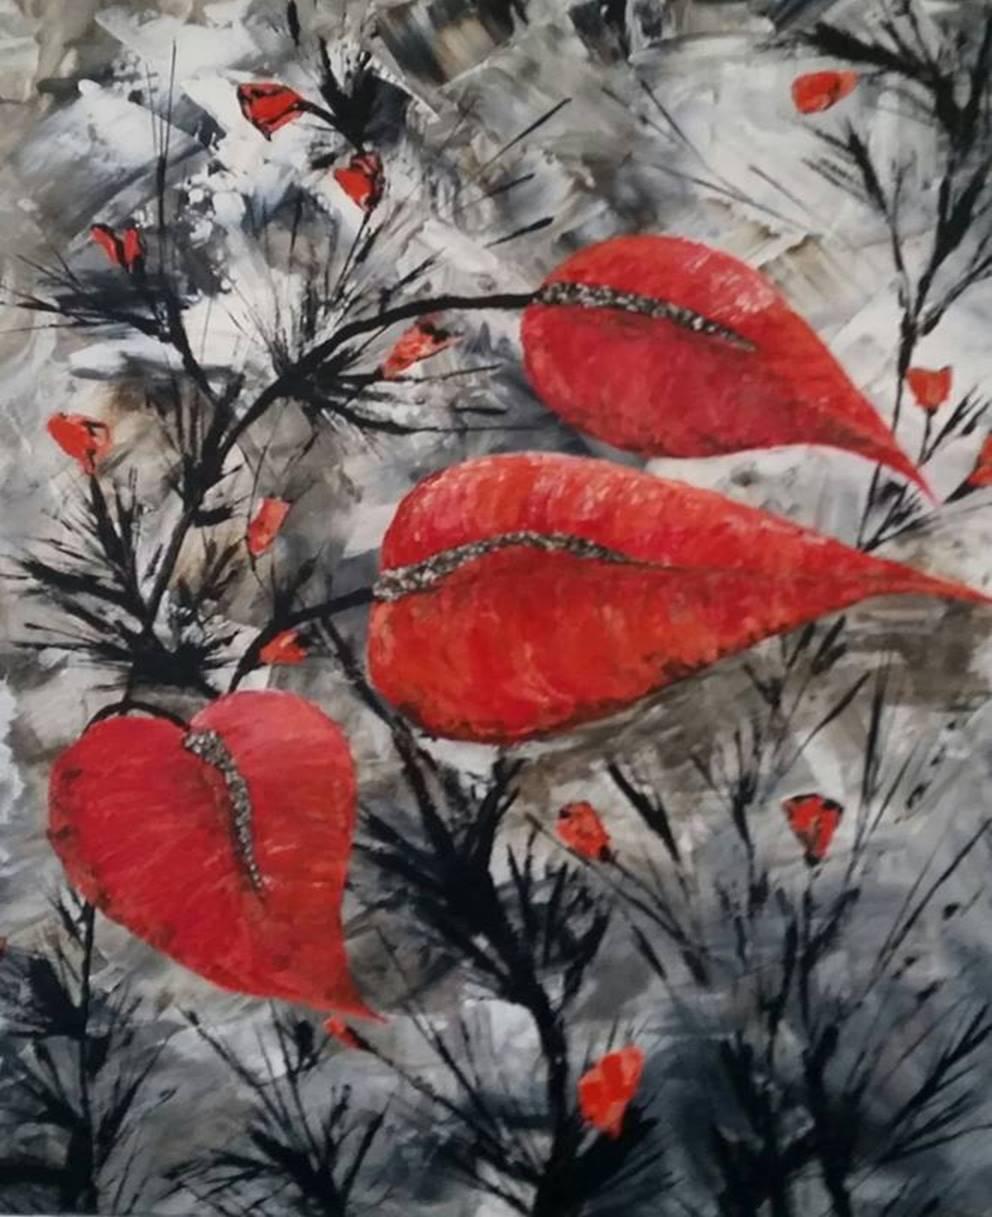 Monochromatic - Floral Series 2 - Art print